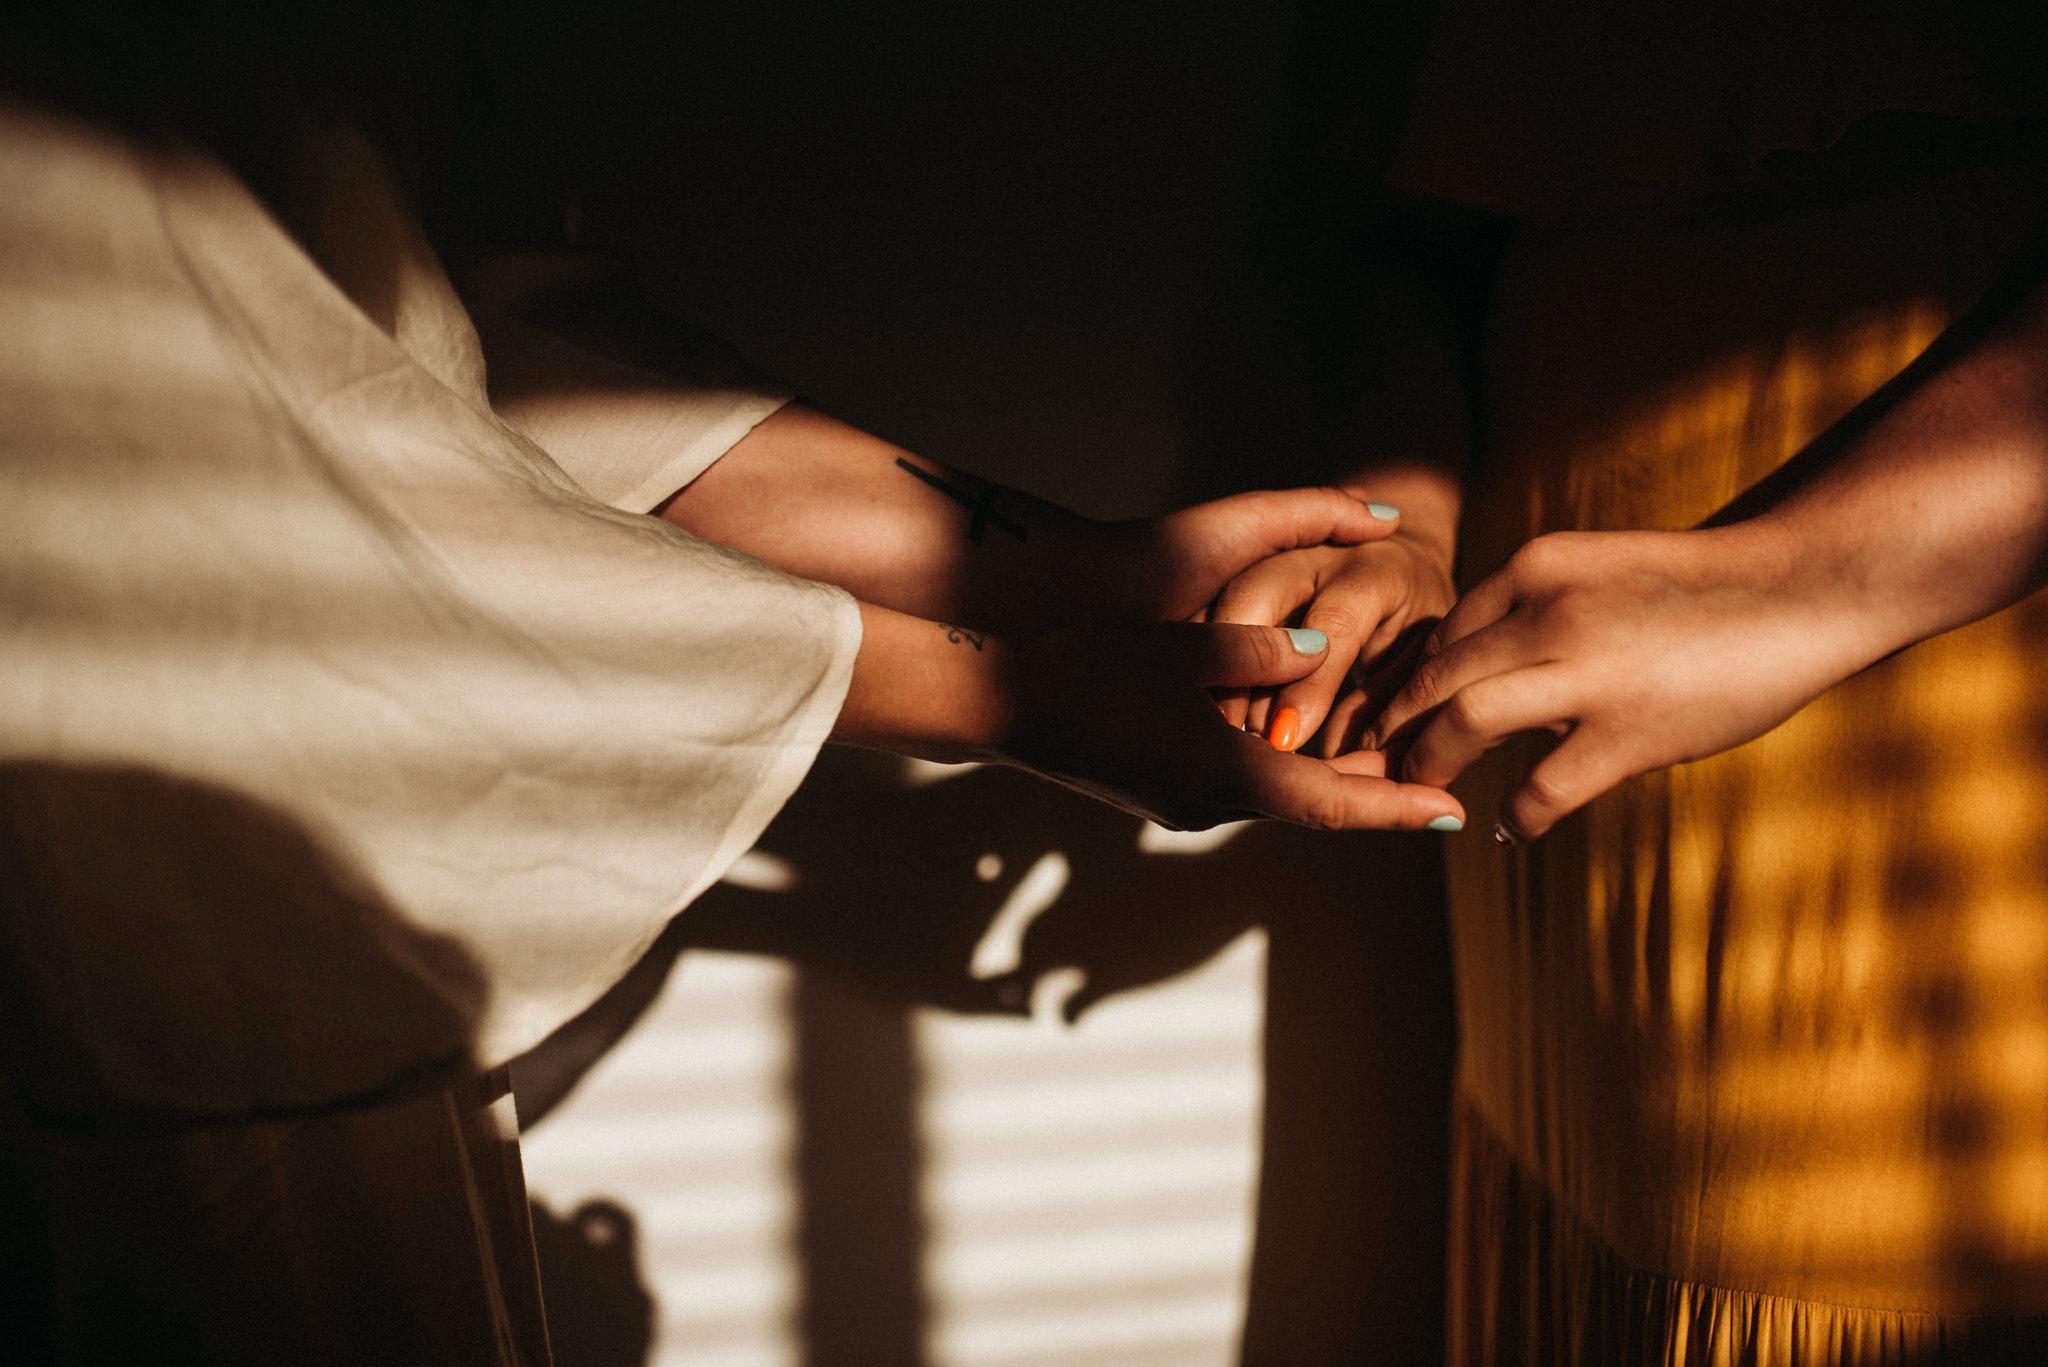 twyla jones photography - treasure coast florida - intimate couples session urban cowboy b&b | brooklyn New York_0019.jpg